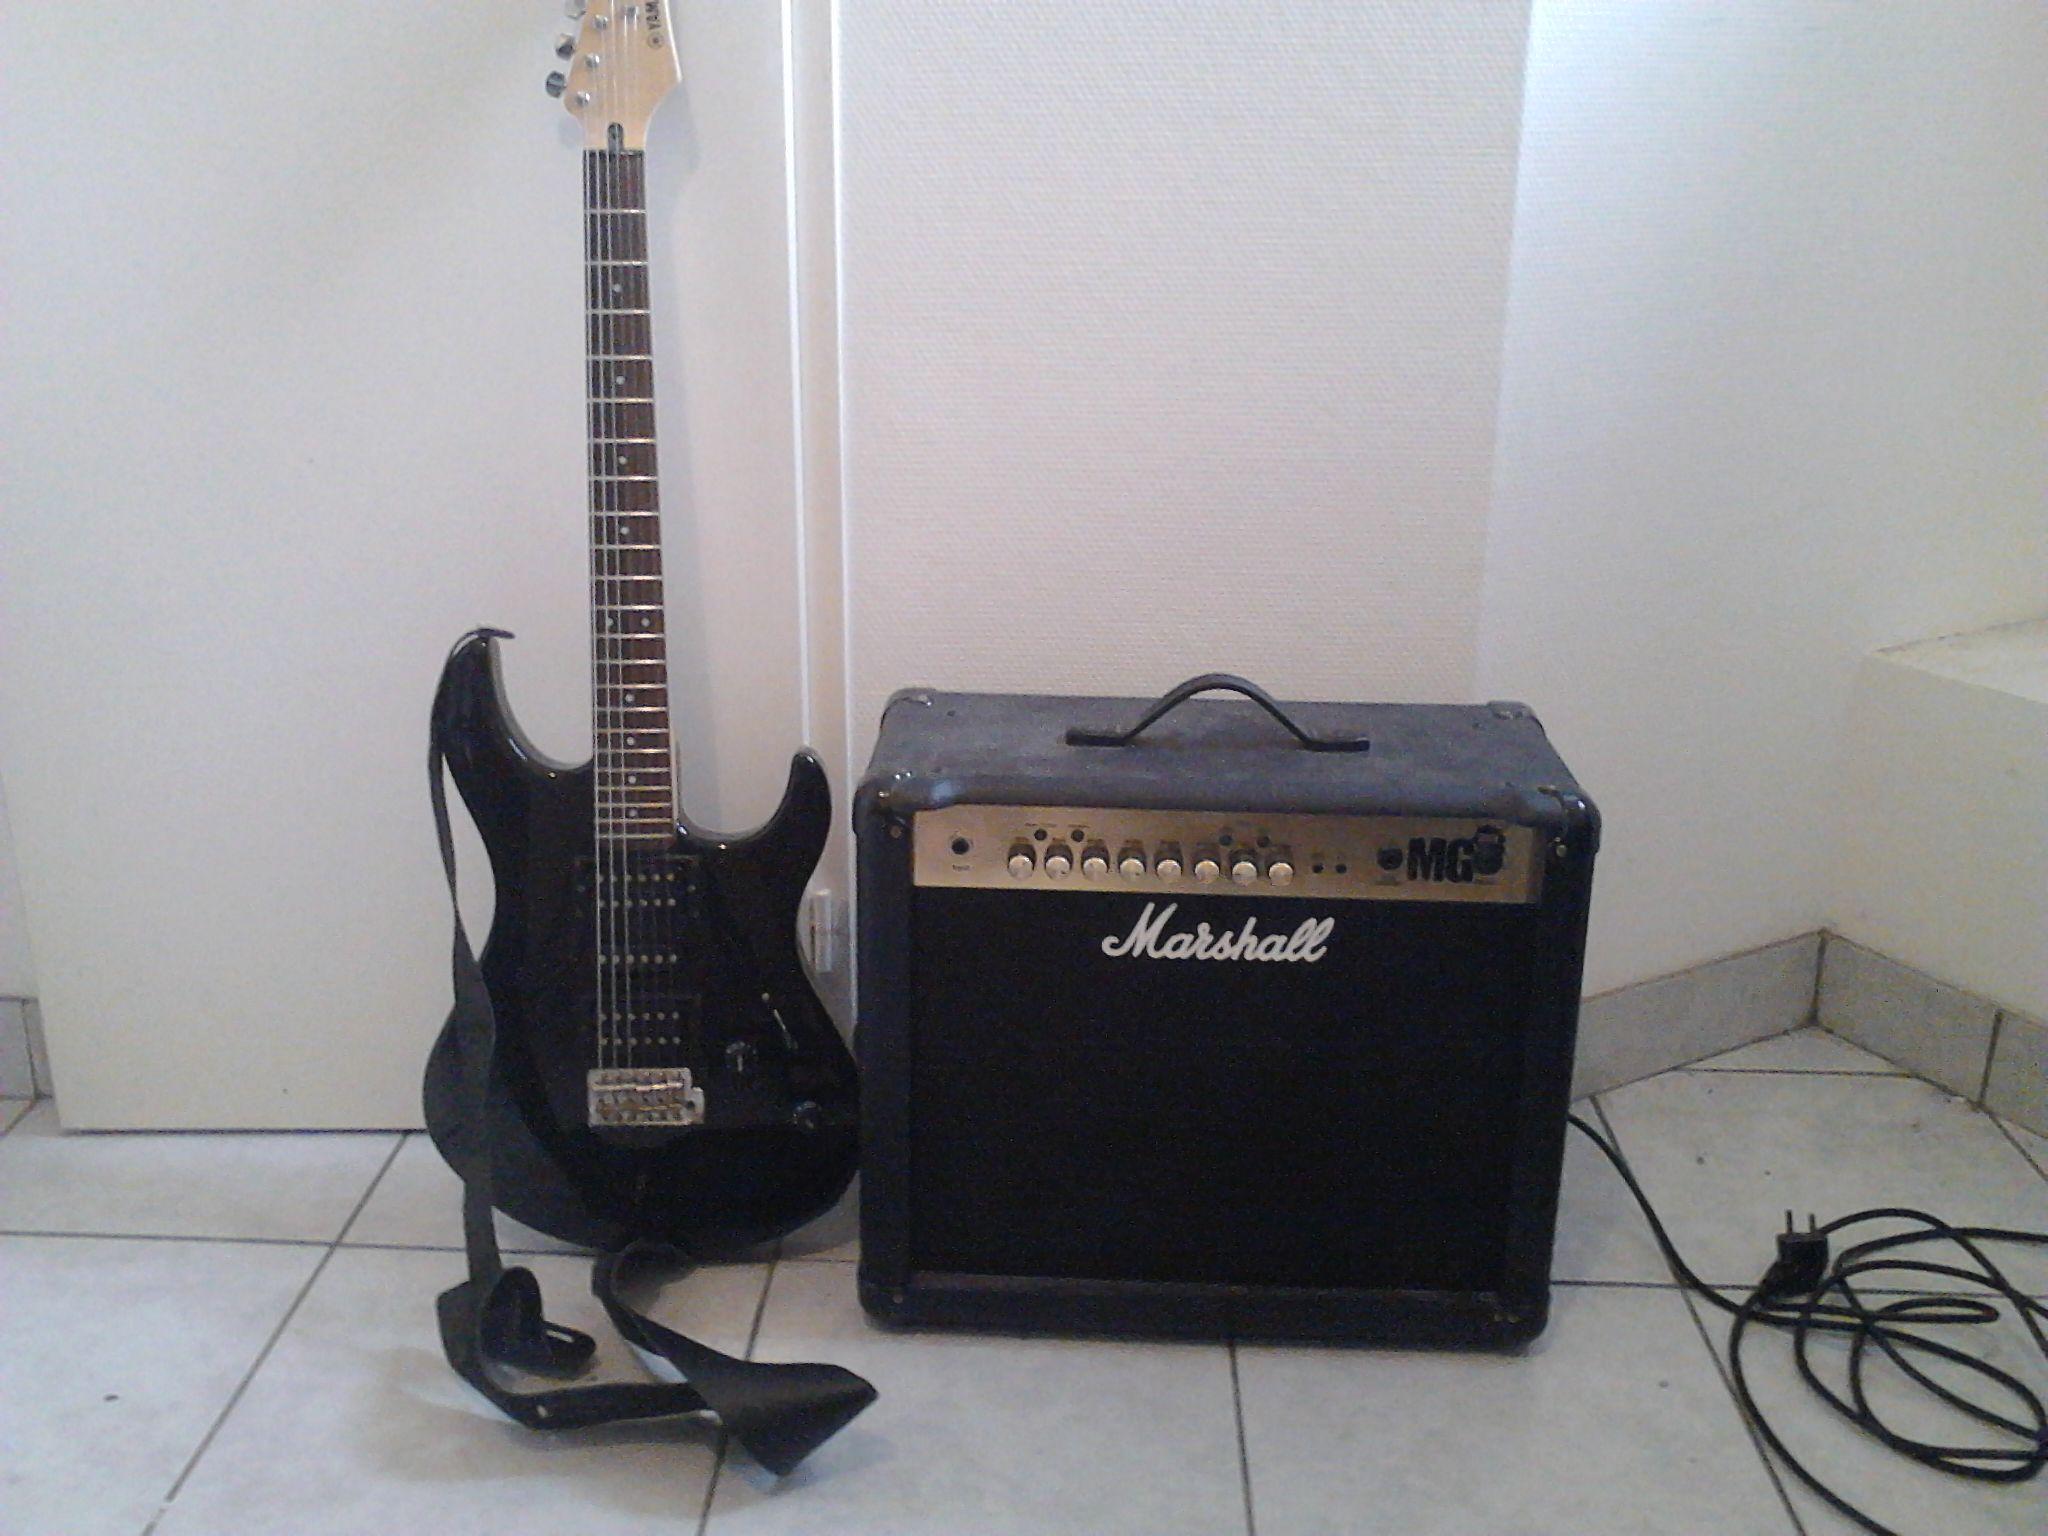 guitare yamaha erg 121 ampli marshall petite annonce. Black Bedroom Furniture Sets. Home Design Ideas